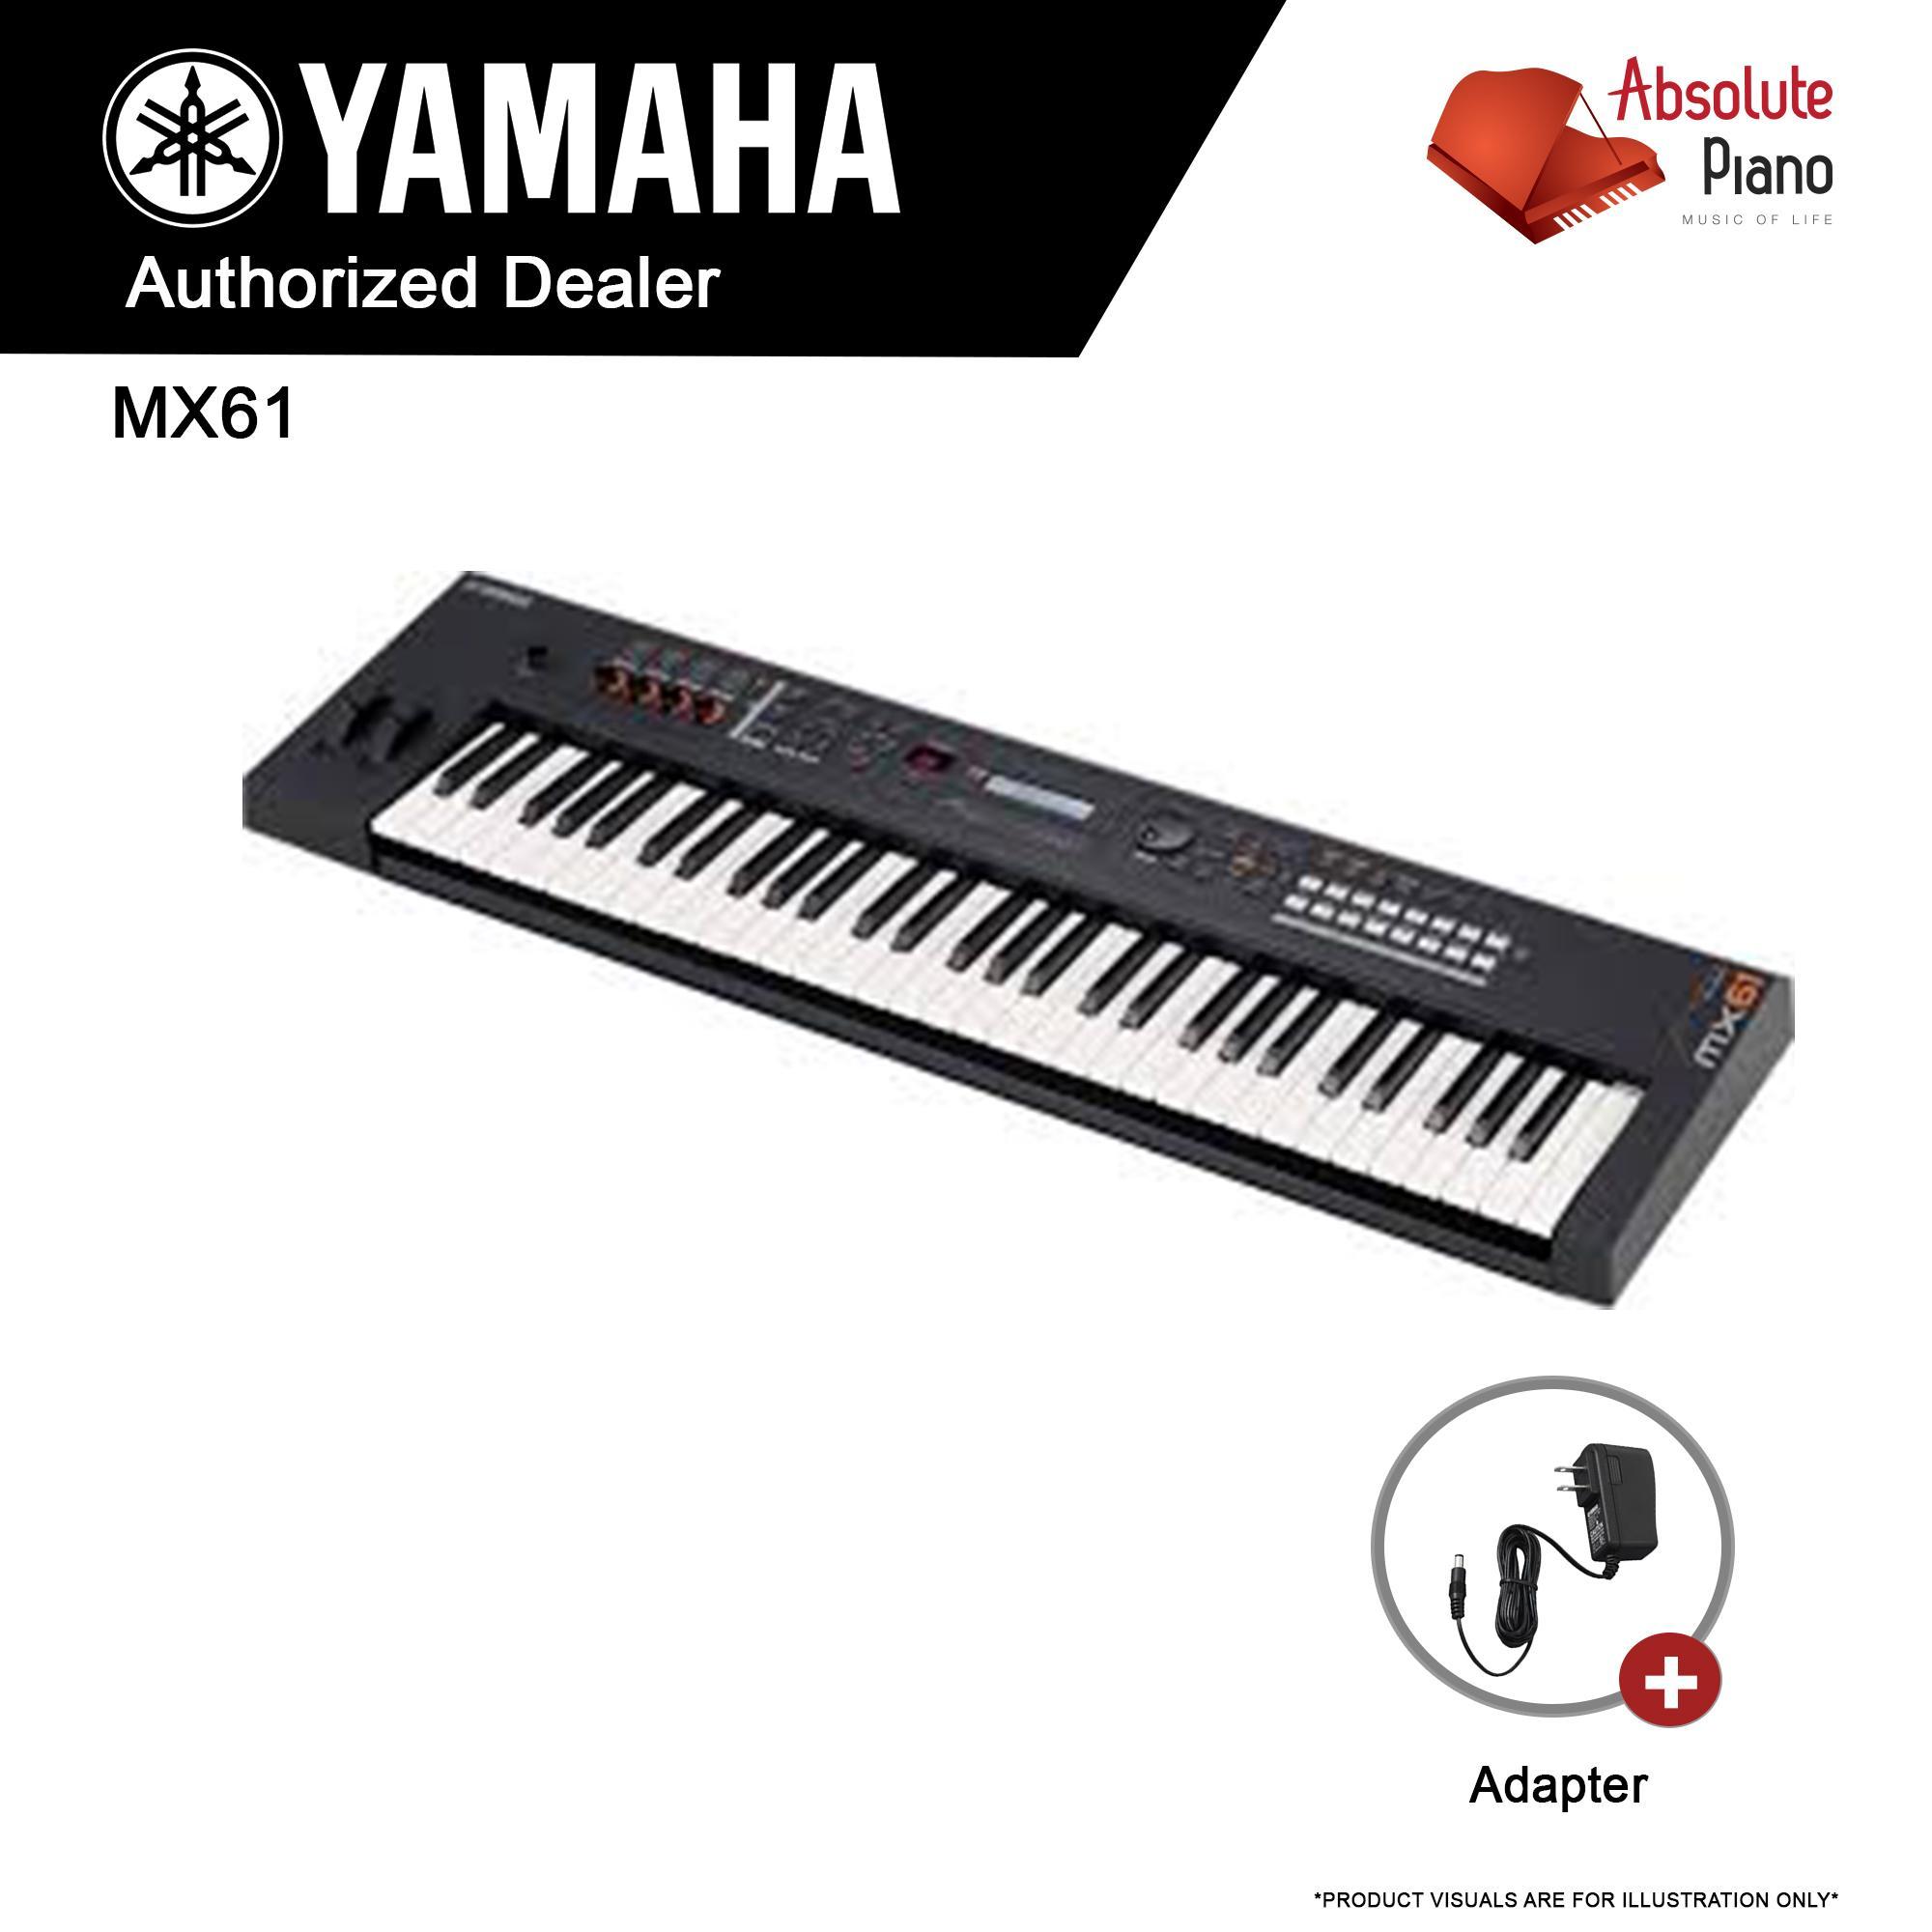 Yamaha Mx61 61-Key Keyboard Production Station (black) - Mx 61 By Absolute Piano.